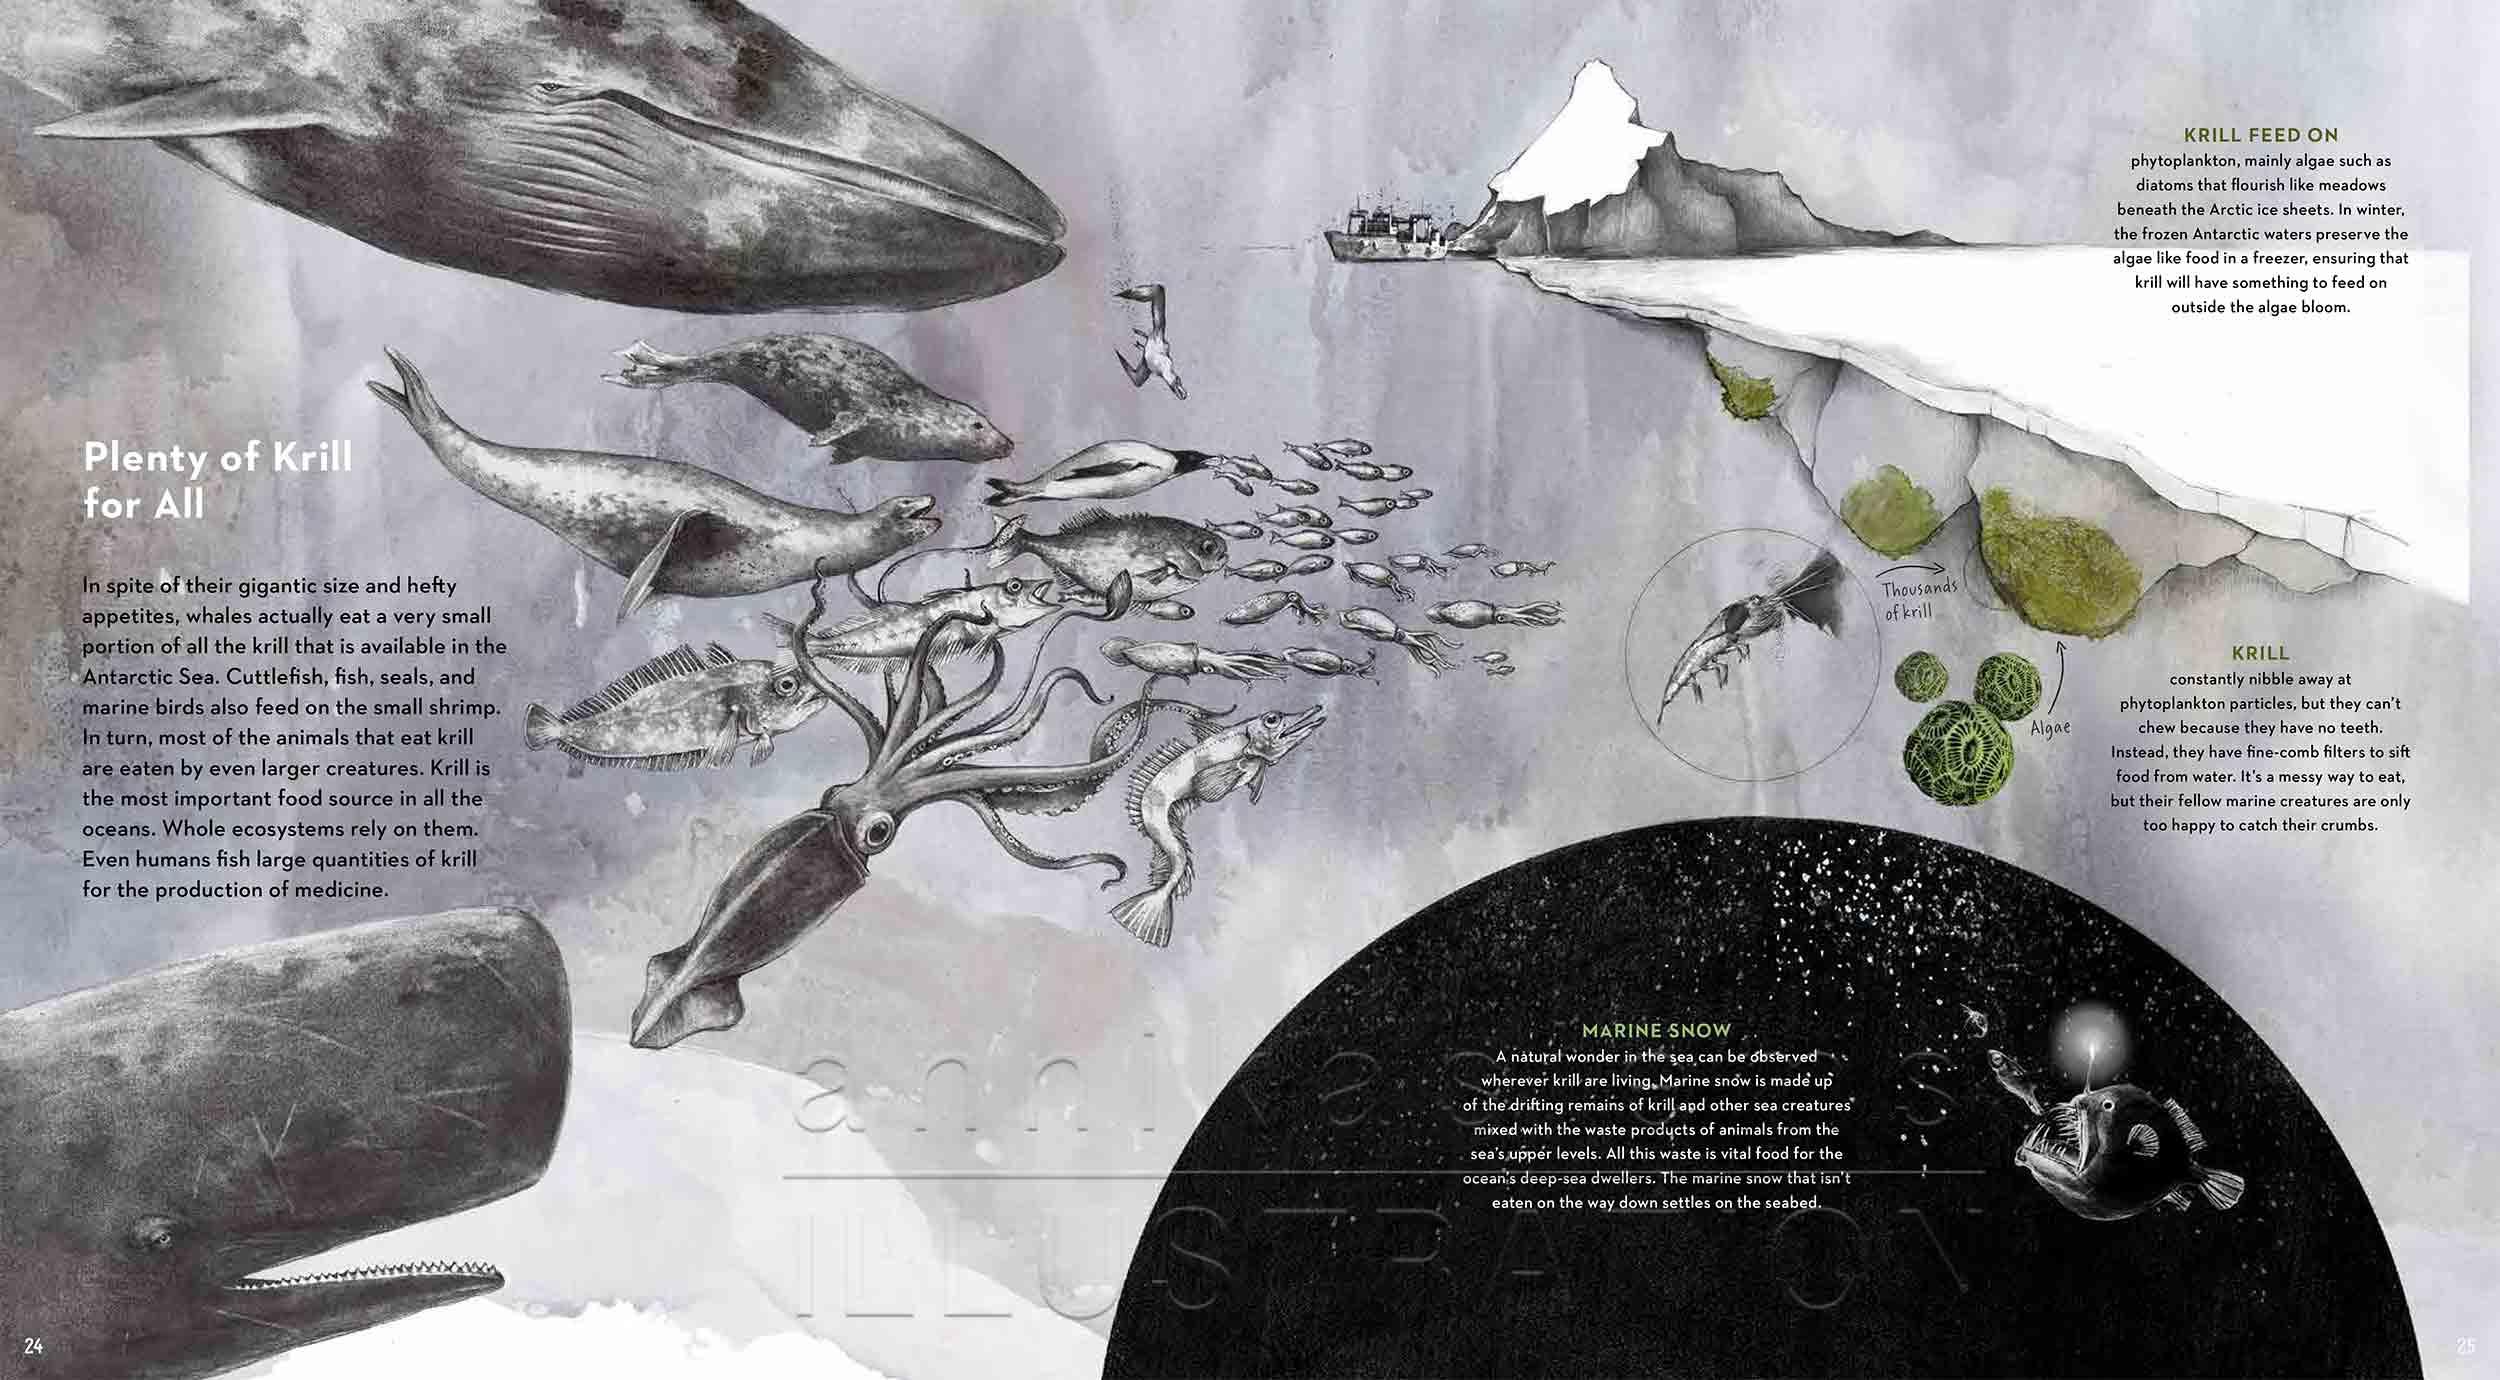 24-25-deep-sea-Englisch-infografic-foochain-krill-©annikasiems-plankton_deepsea-zooplankton.jpg